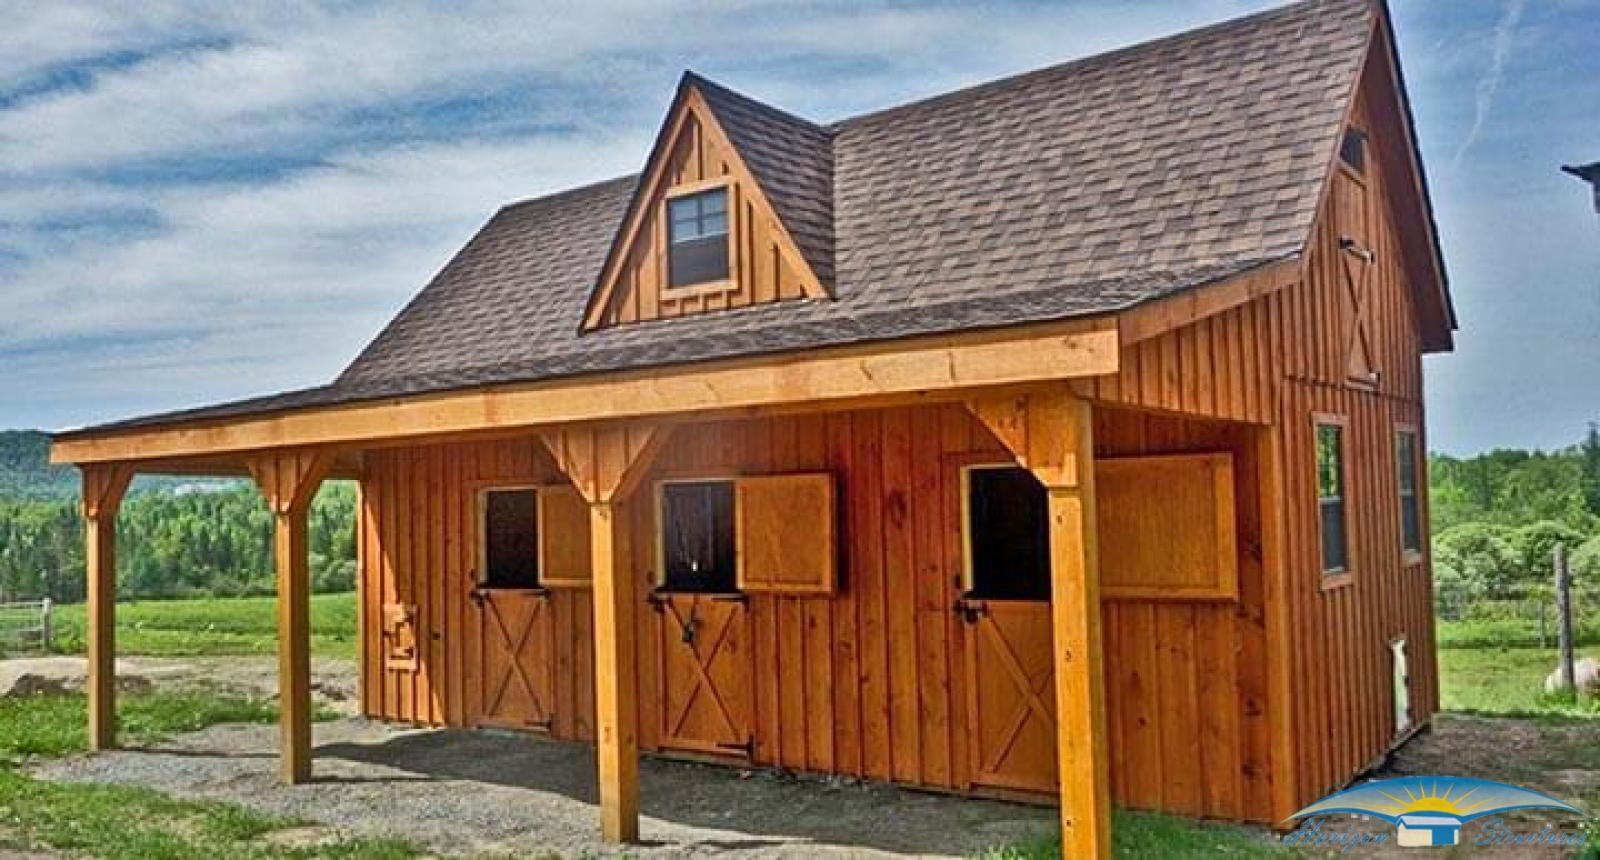 horse-barns-miniature-barns-14x28-mini-raised-roof_0